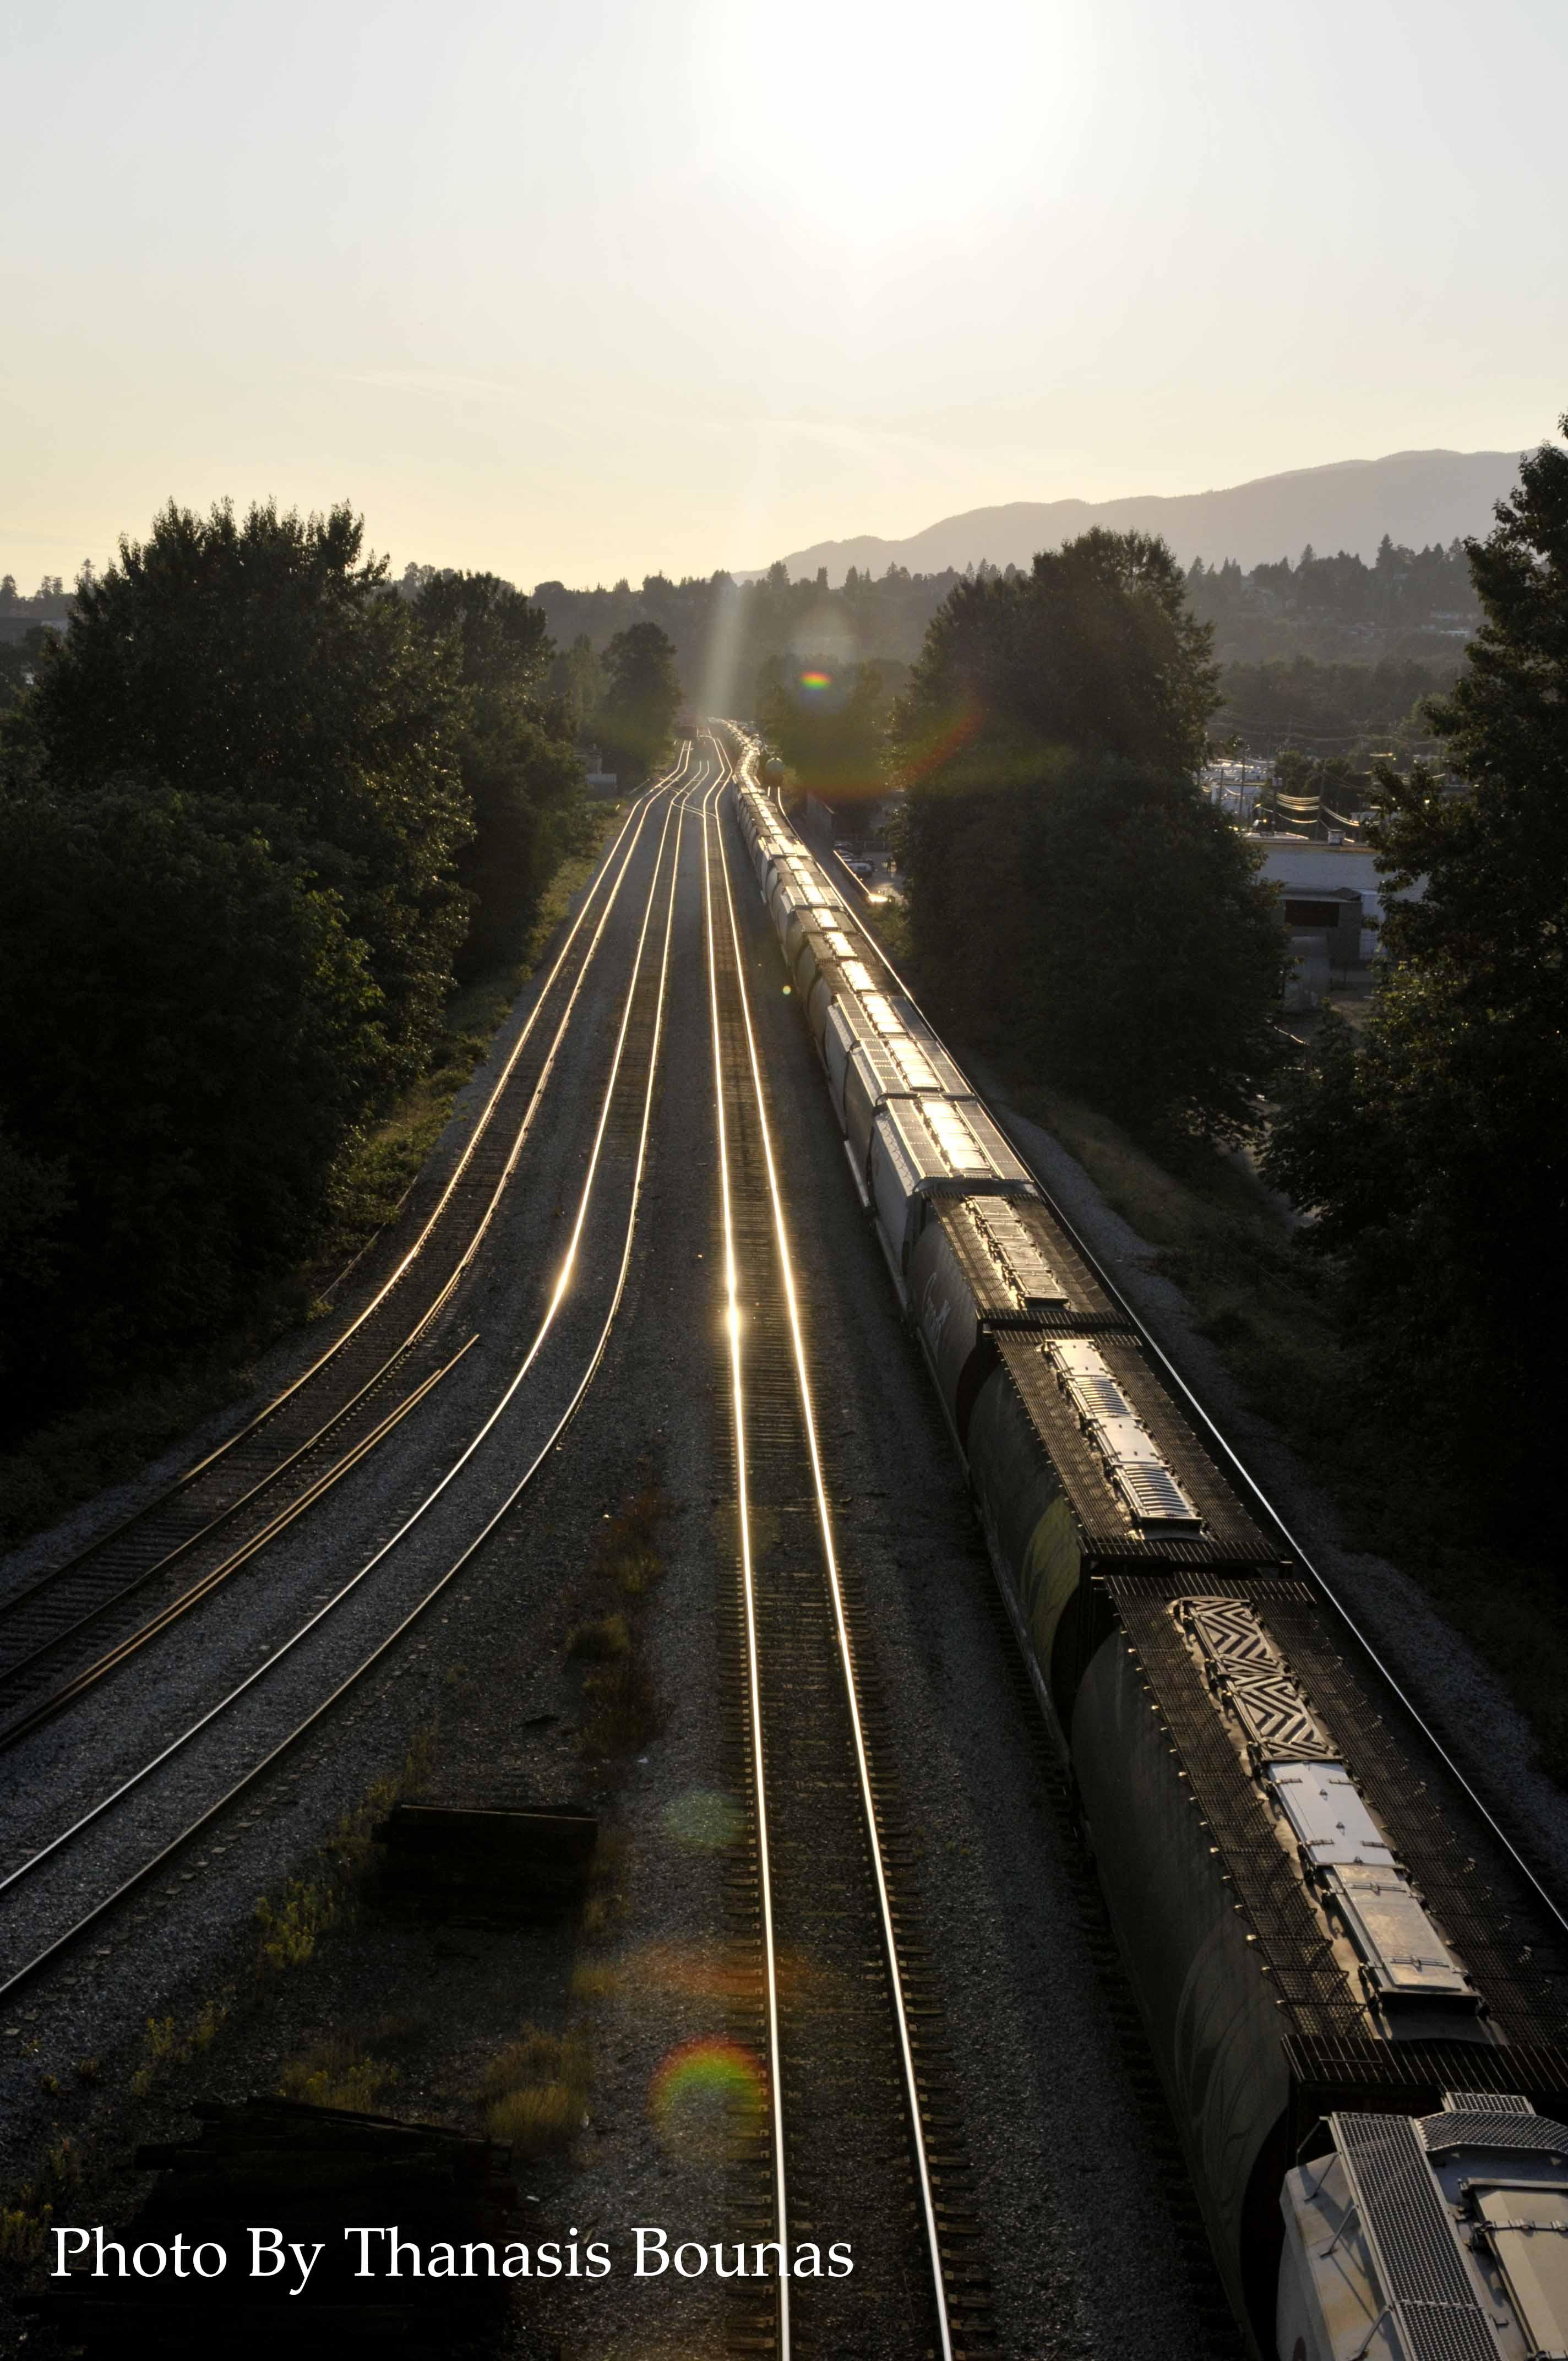 13 Trains Beautiful British Columbia Photo By Thanasis Bounas